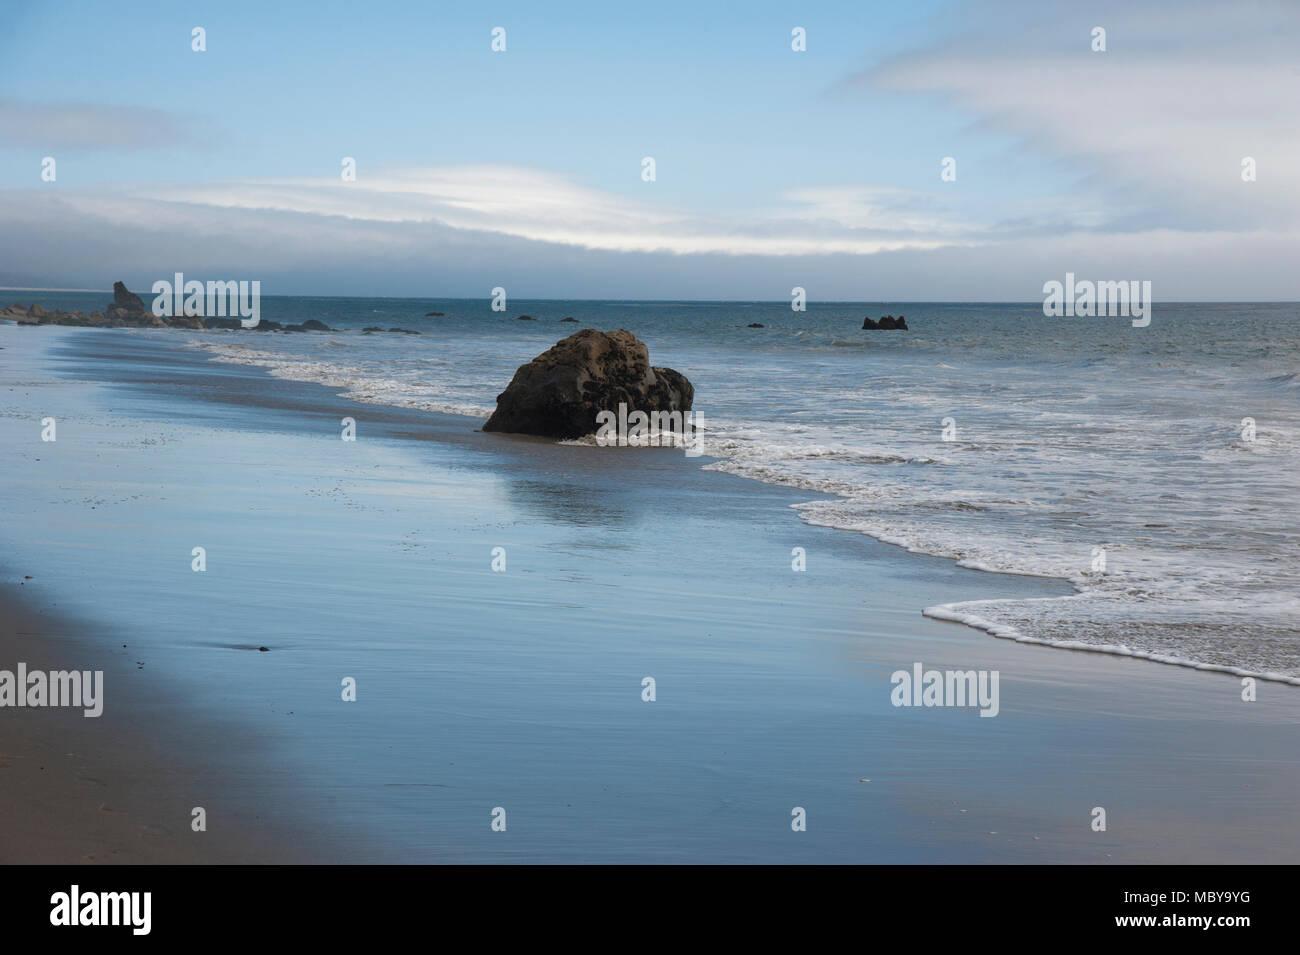 Beach on the Southern California coast near Malibu - Stock Image